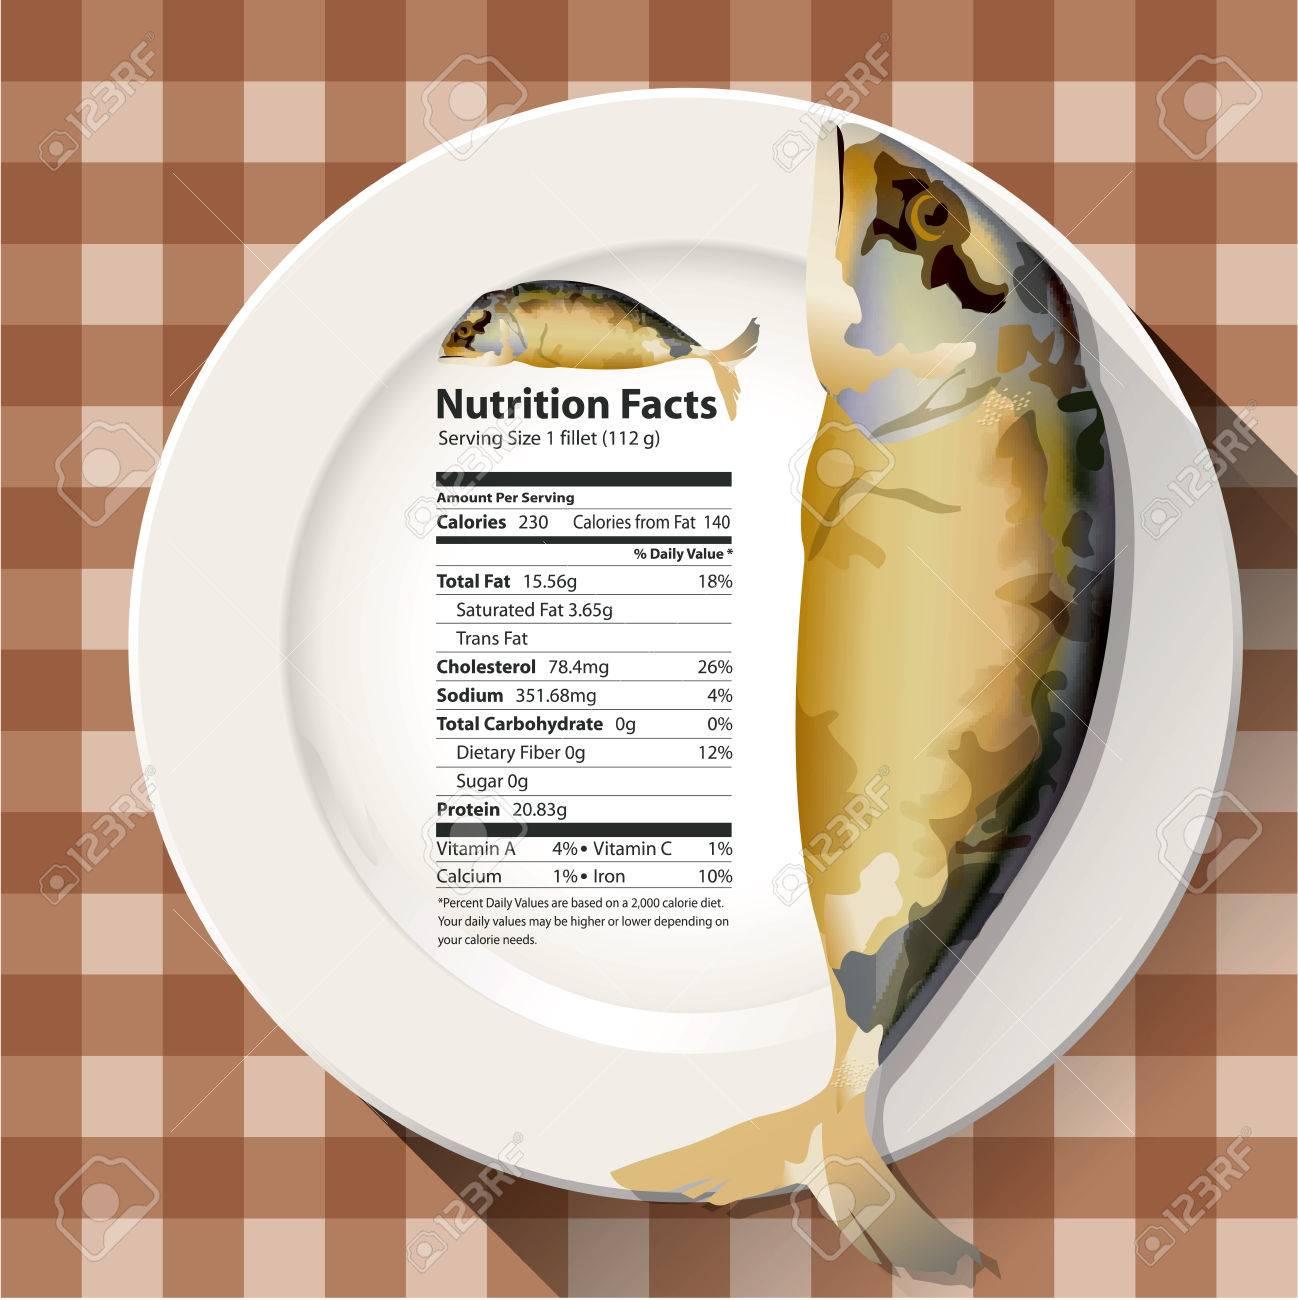 How many calories in mackerel